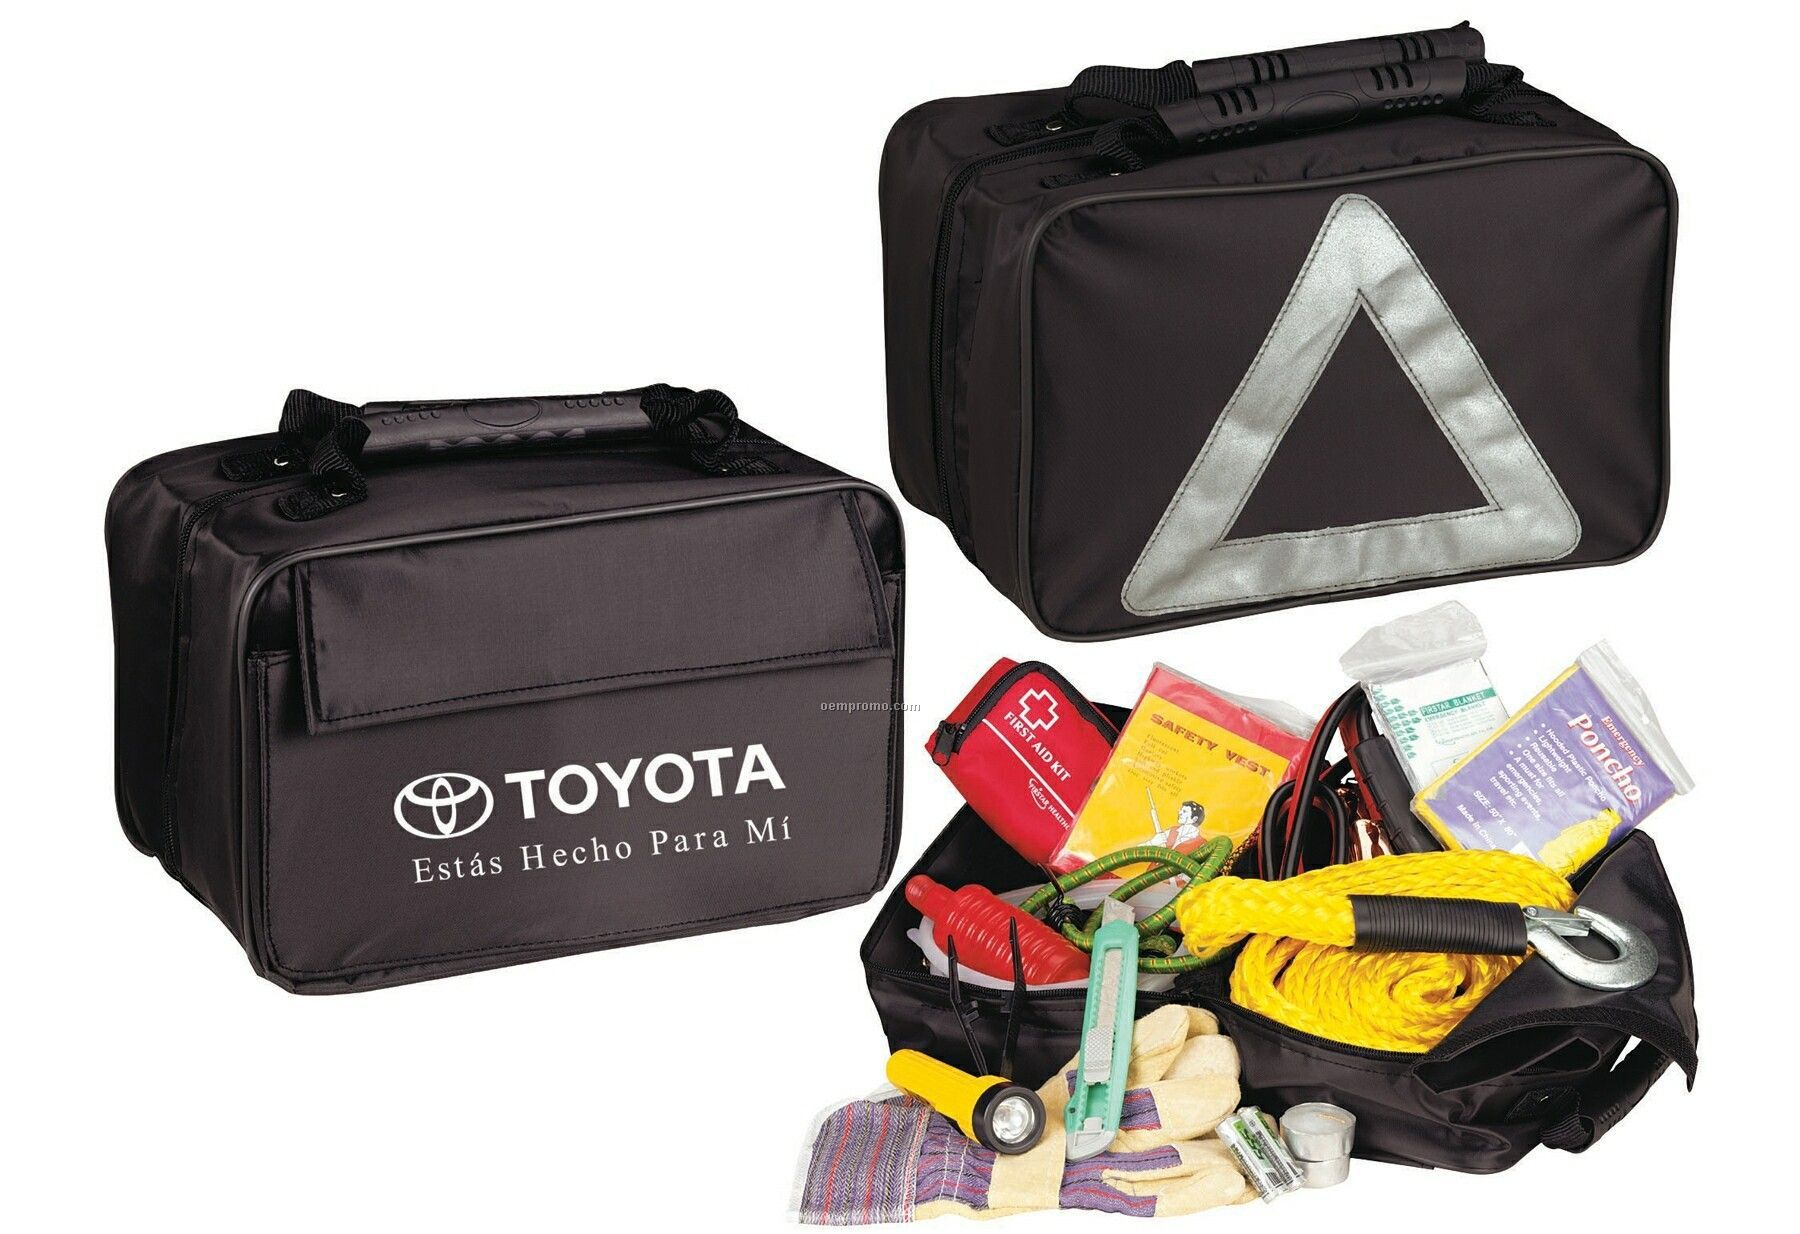 Sentry Safety Reflective Highway Kit